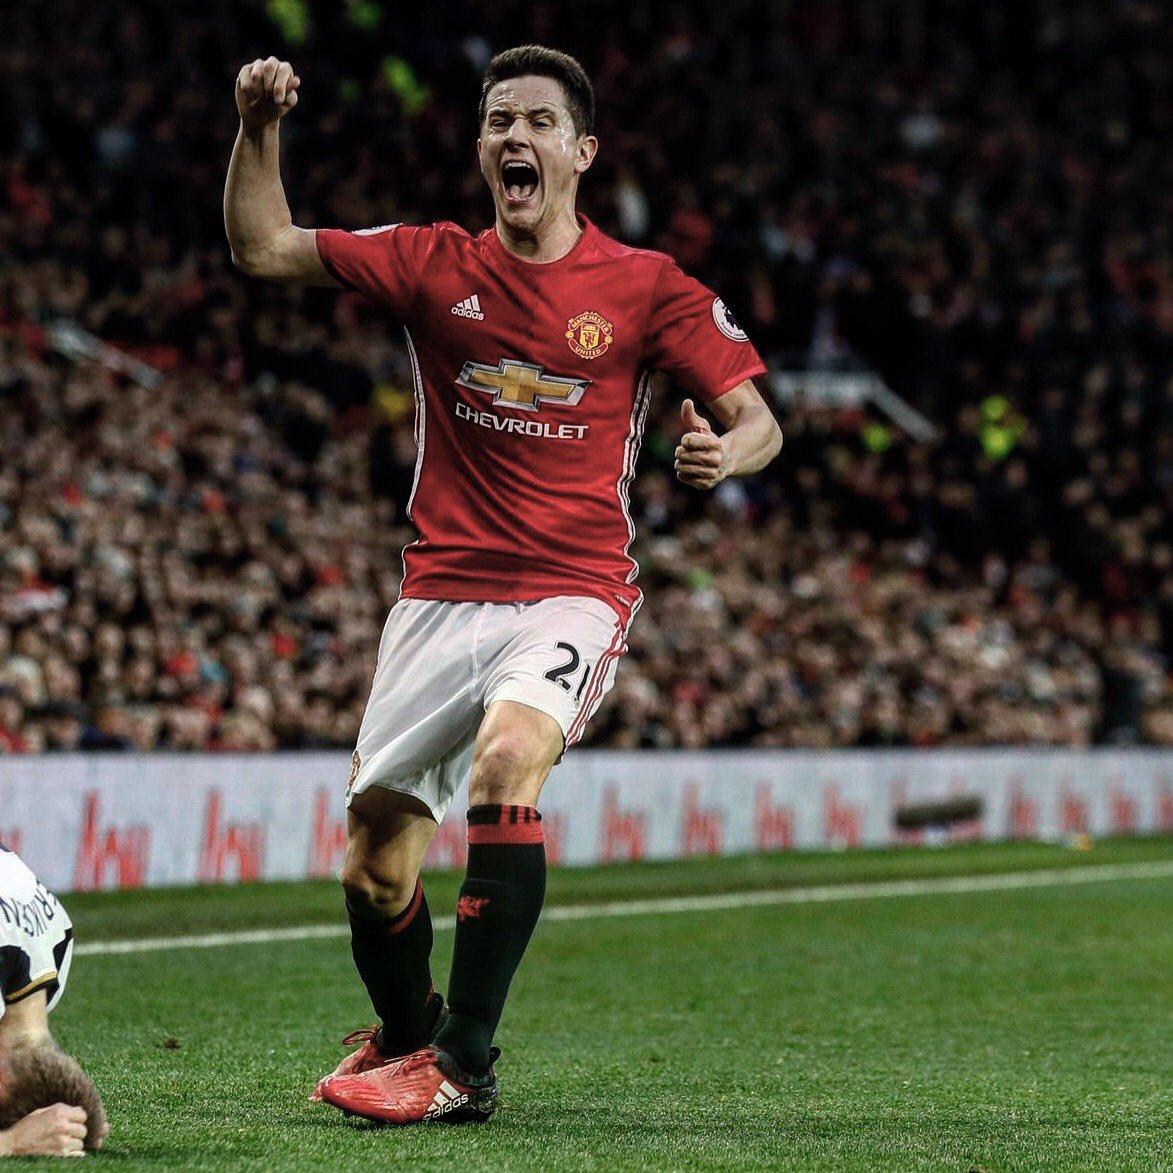 Happy birthday to Ander Herrera. The Manchester United midfielder turns 28 today.